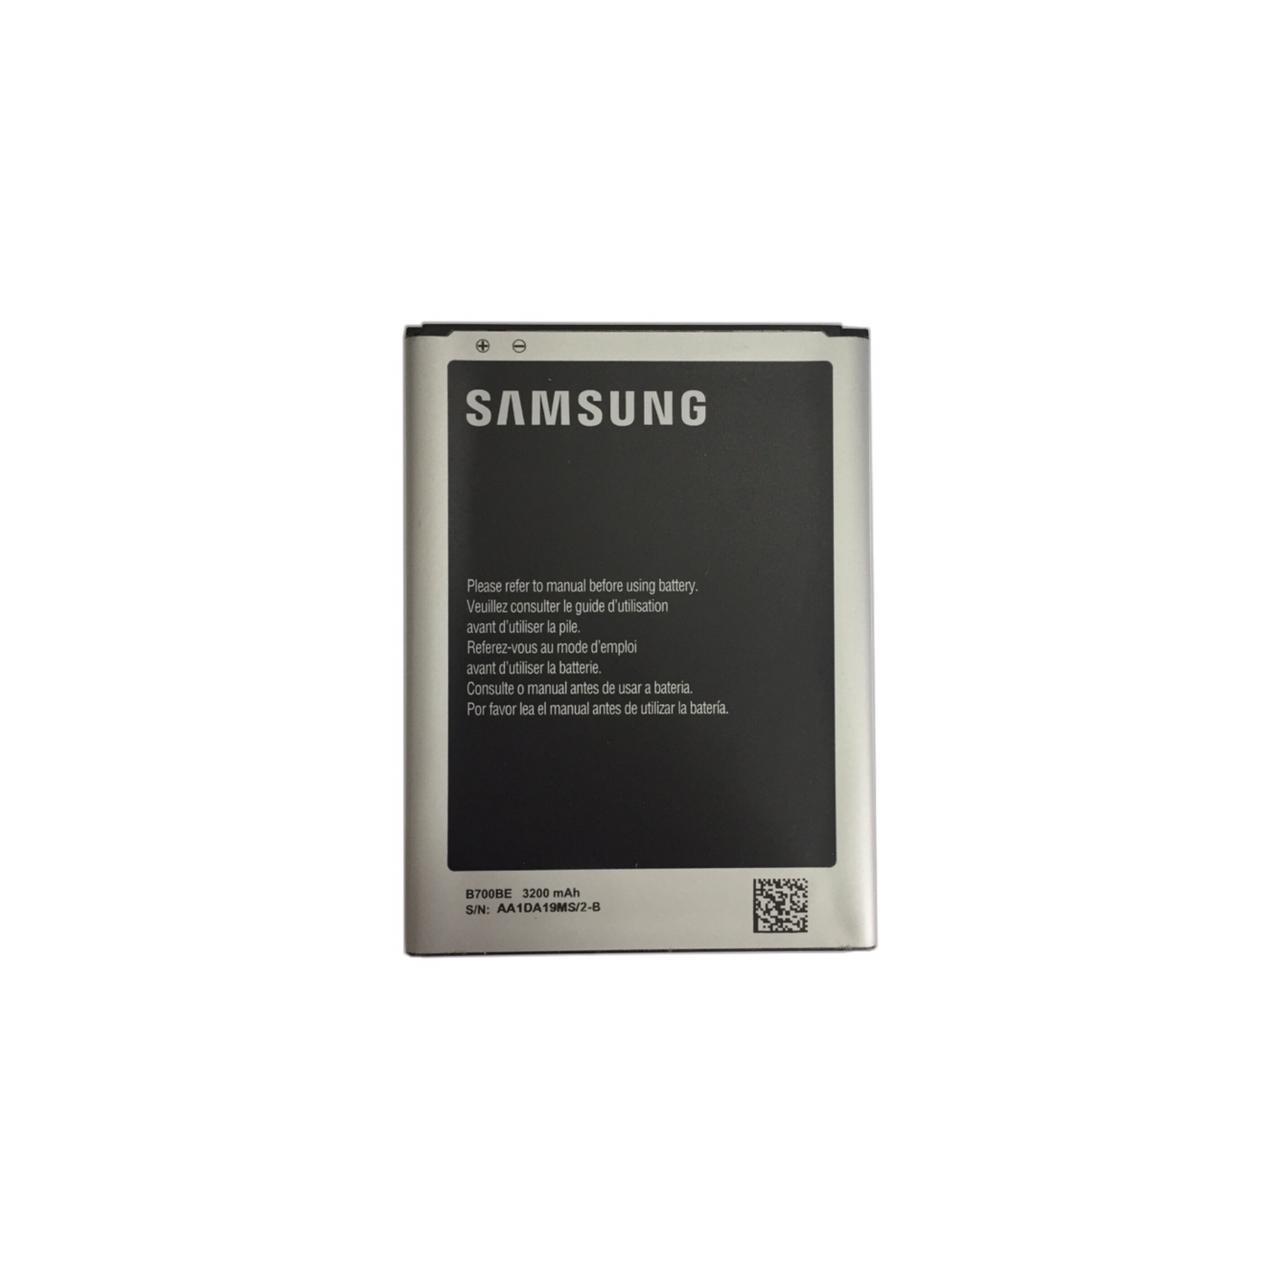 Bateria Samsung Galaxy Mega Gt-9200 3200mah/3.8v Original